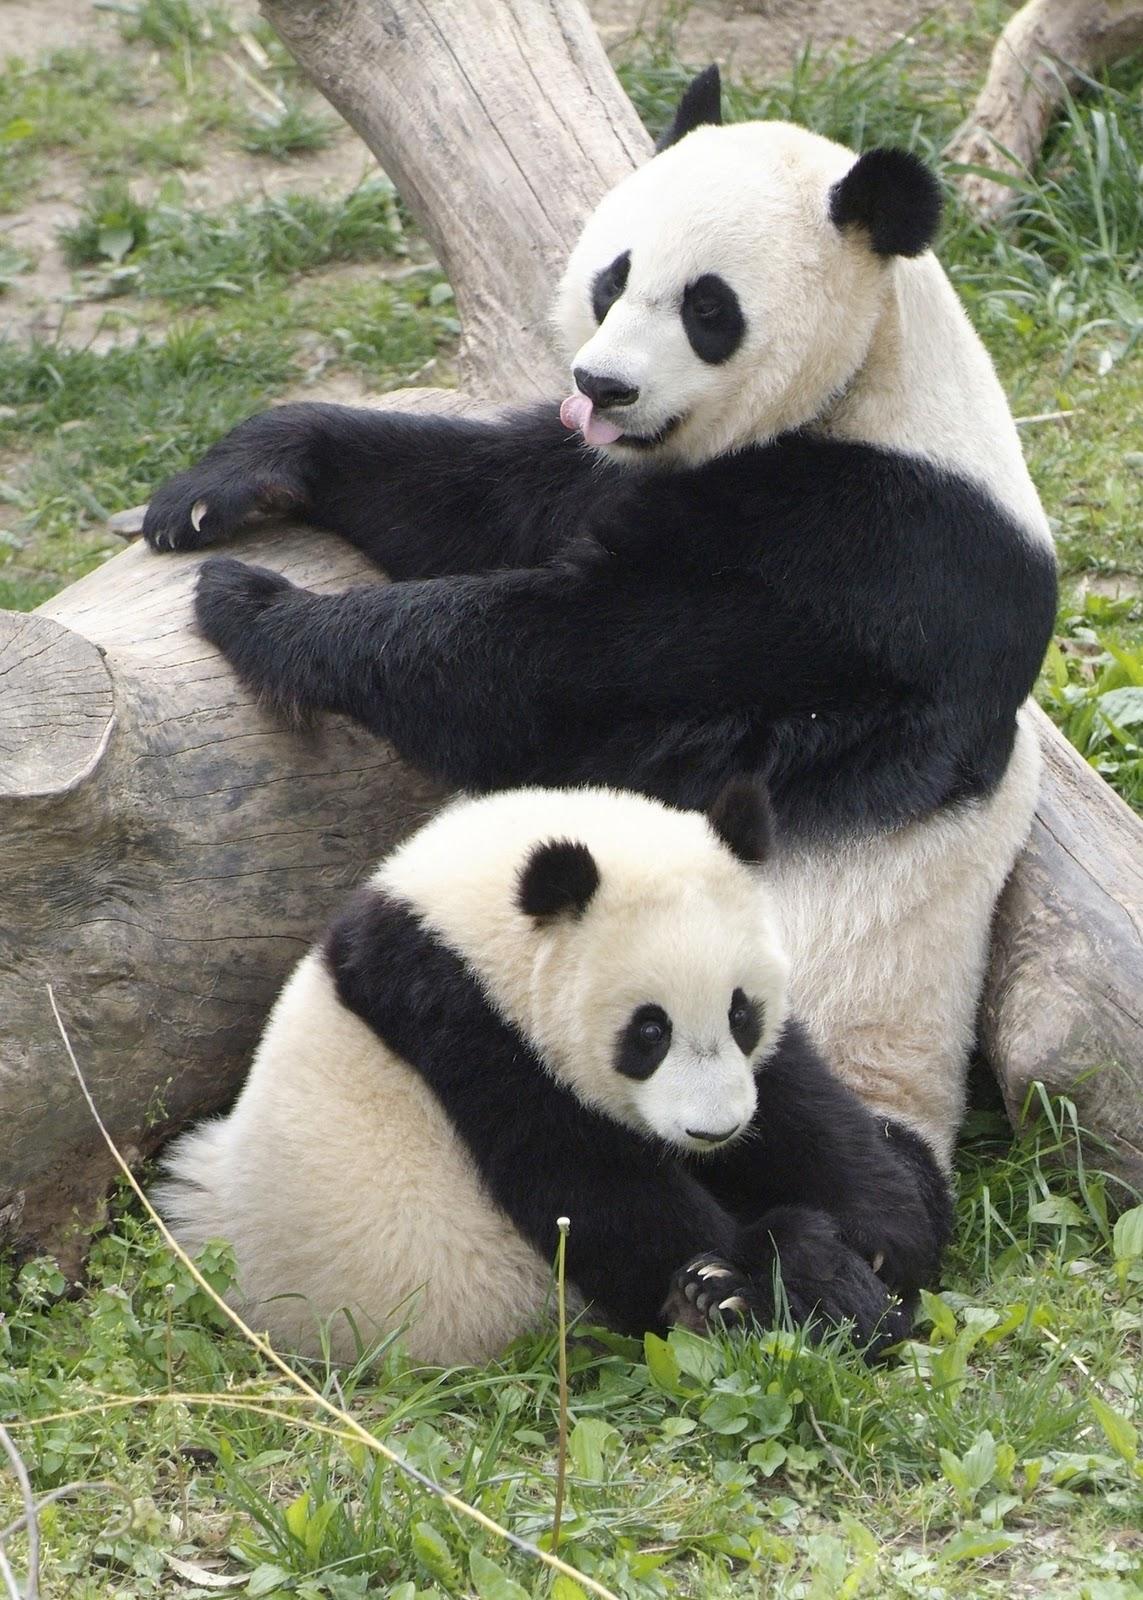 Amazing Giant Panda Endangered Species Giant Pandas